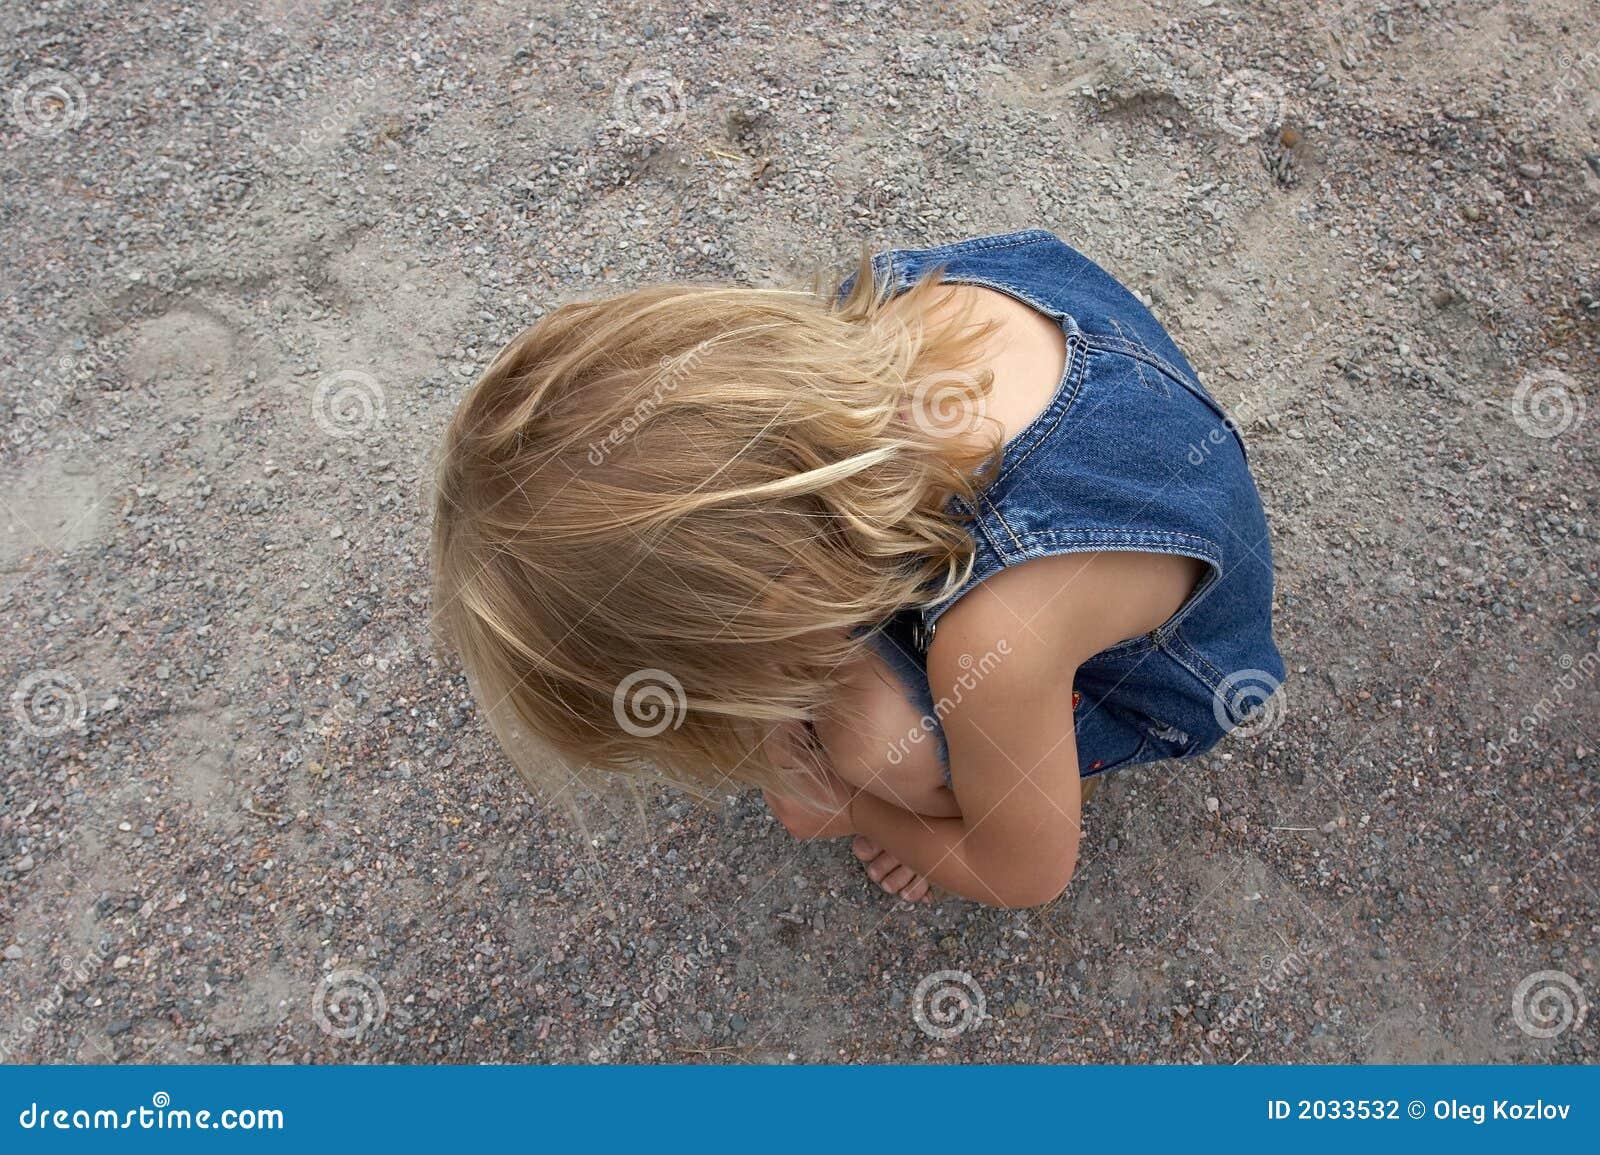 Трахнул молодую девочку фото 14 фотография